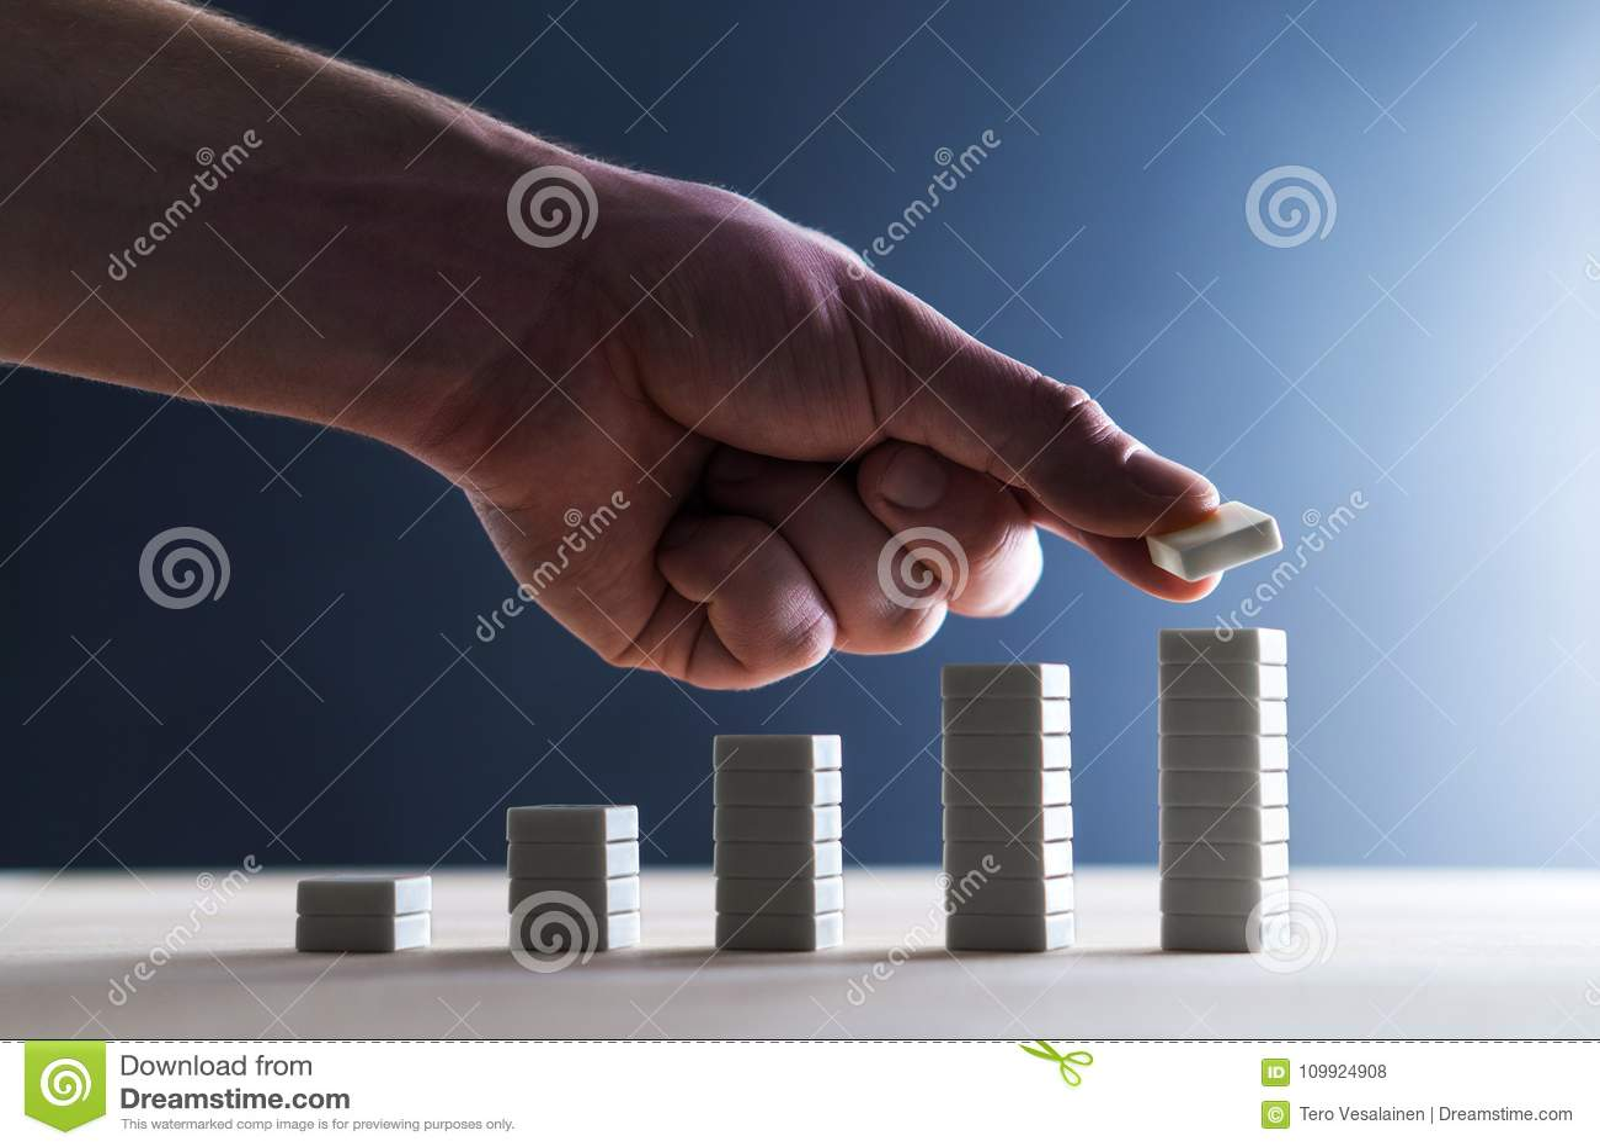 Vooruitgang, planningsstrategie, stijging van verkoop of succes